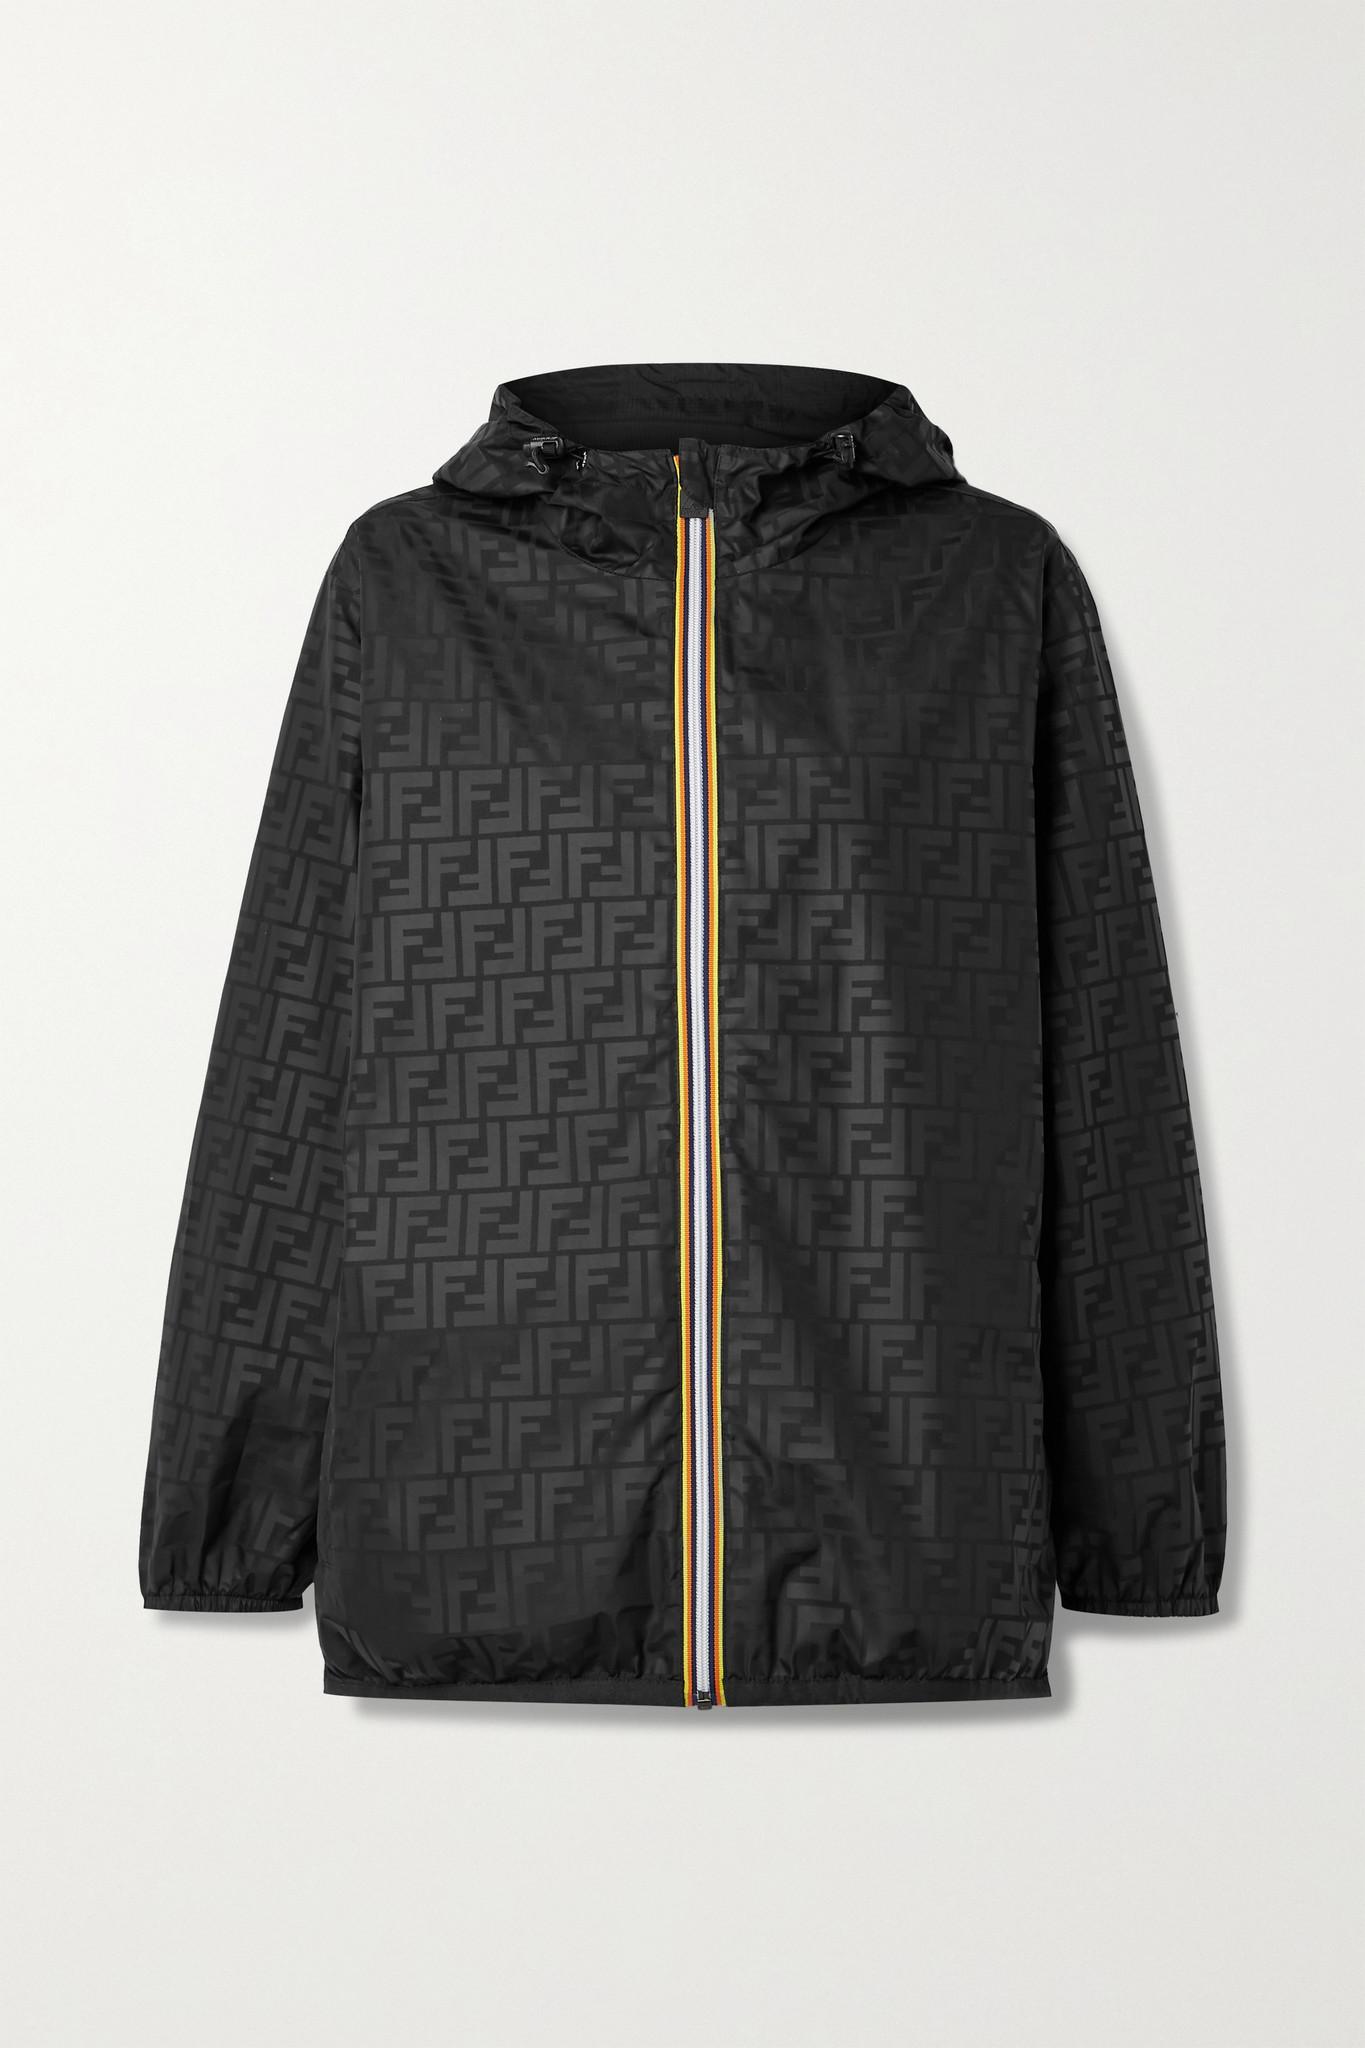 FENDI - X K-way 正反两穿印花软壳面料格子布连帽夹克 - 黑色 - large